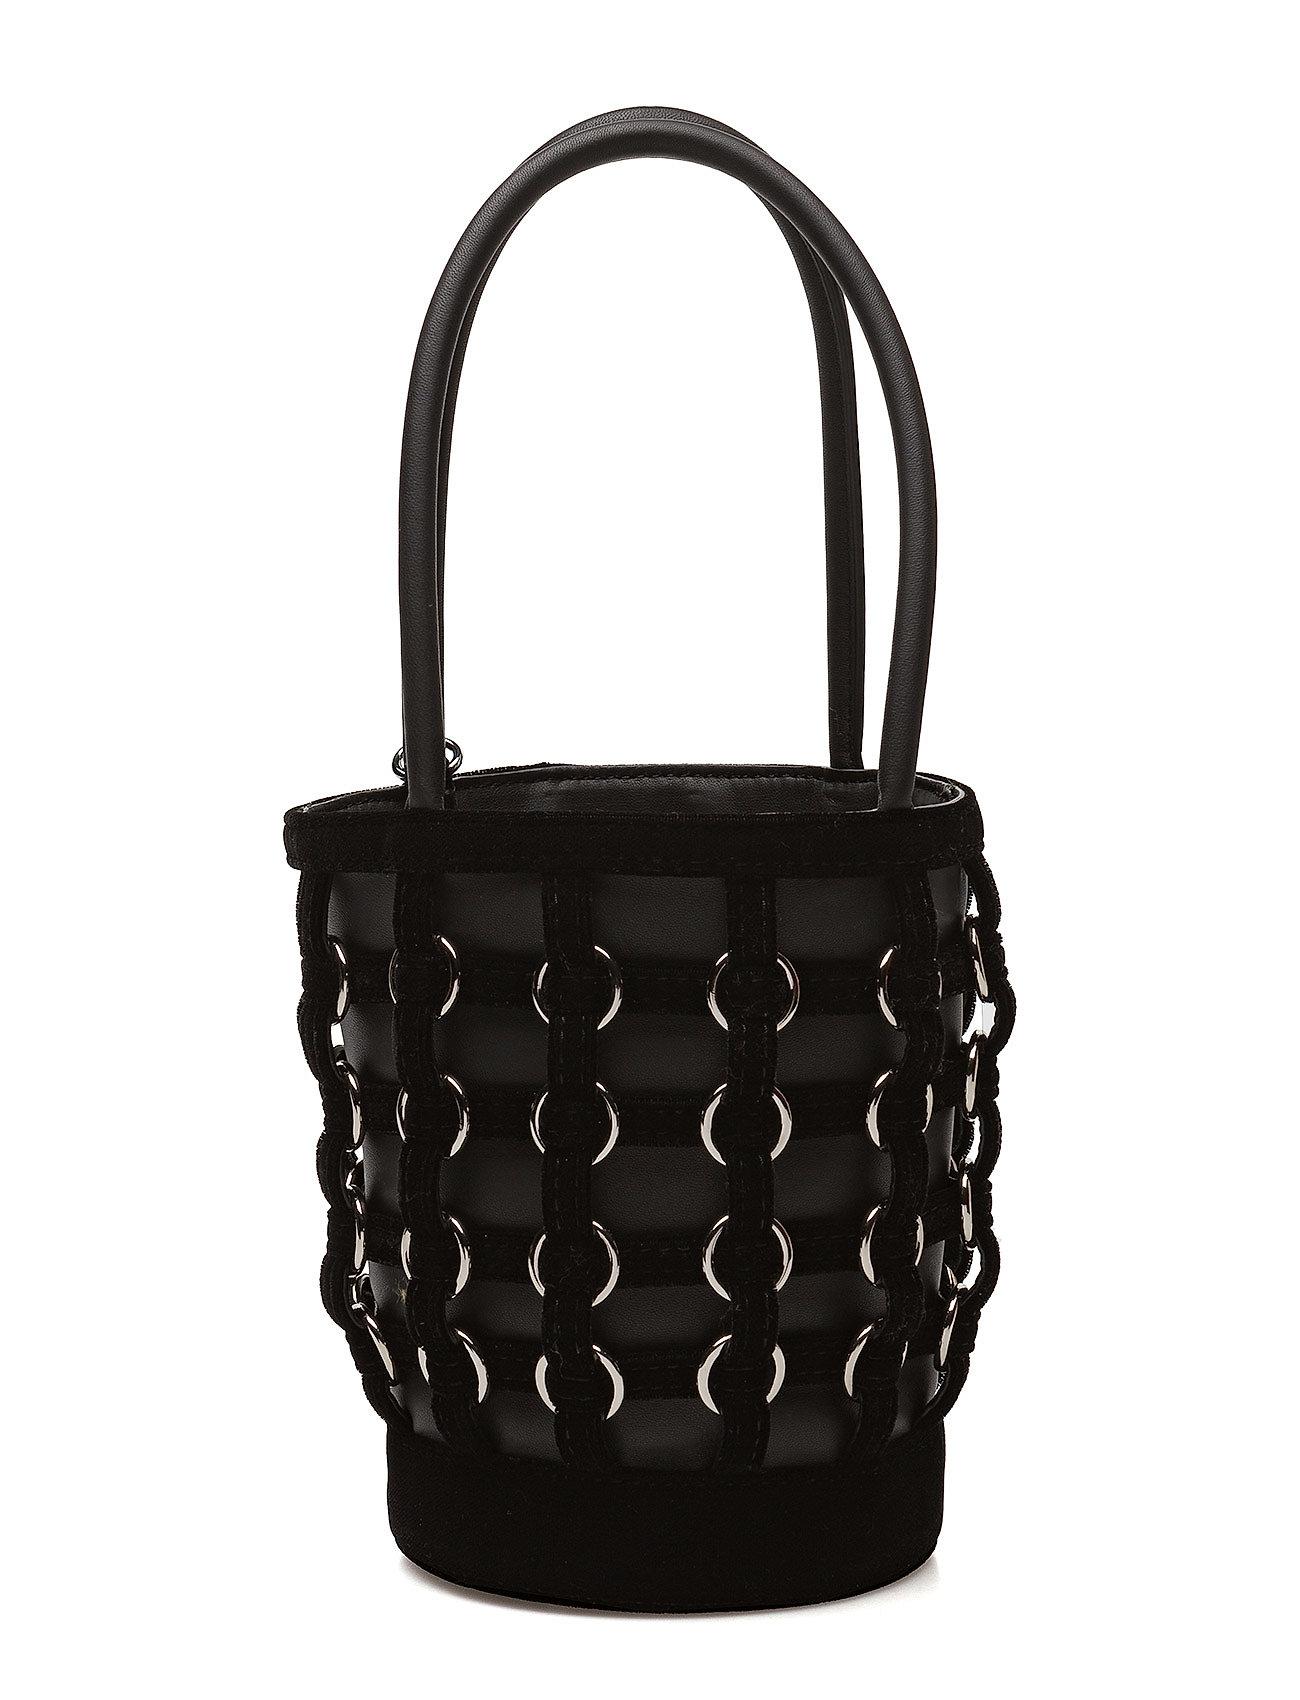 alexander wang Roxy mini bucket blk w/rng cge hvy silky velvet/ir på boozt.com dk